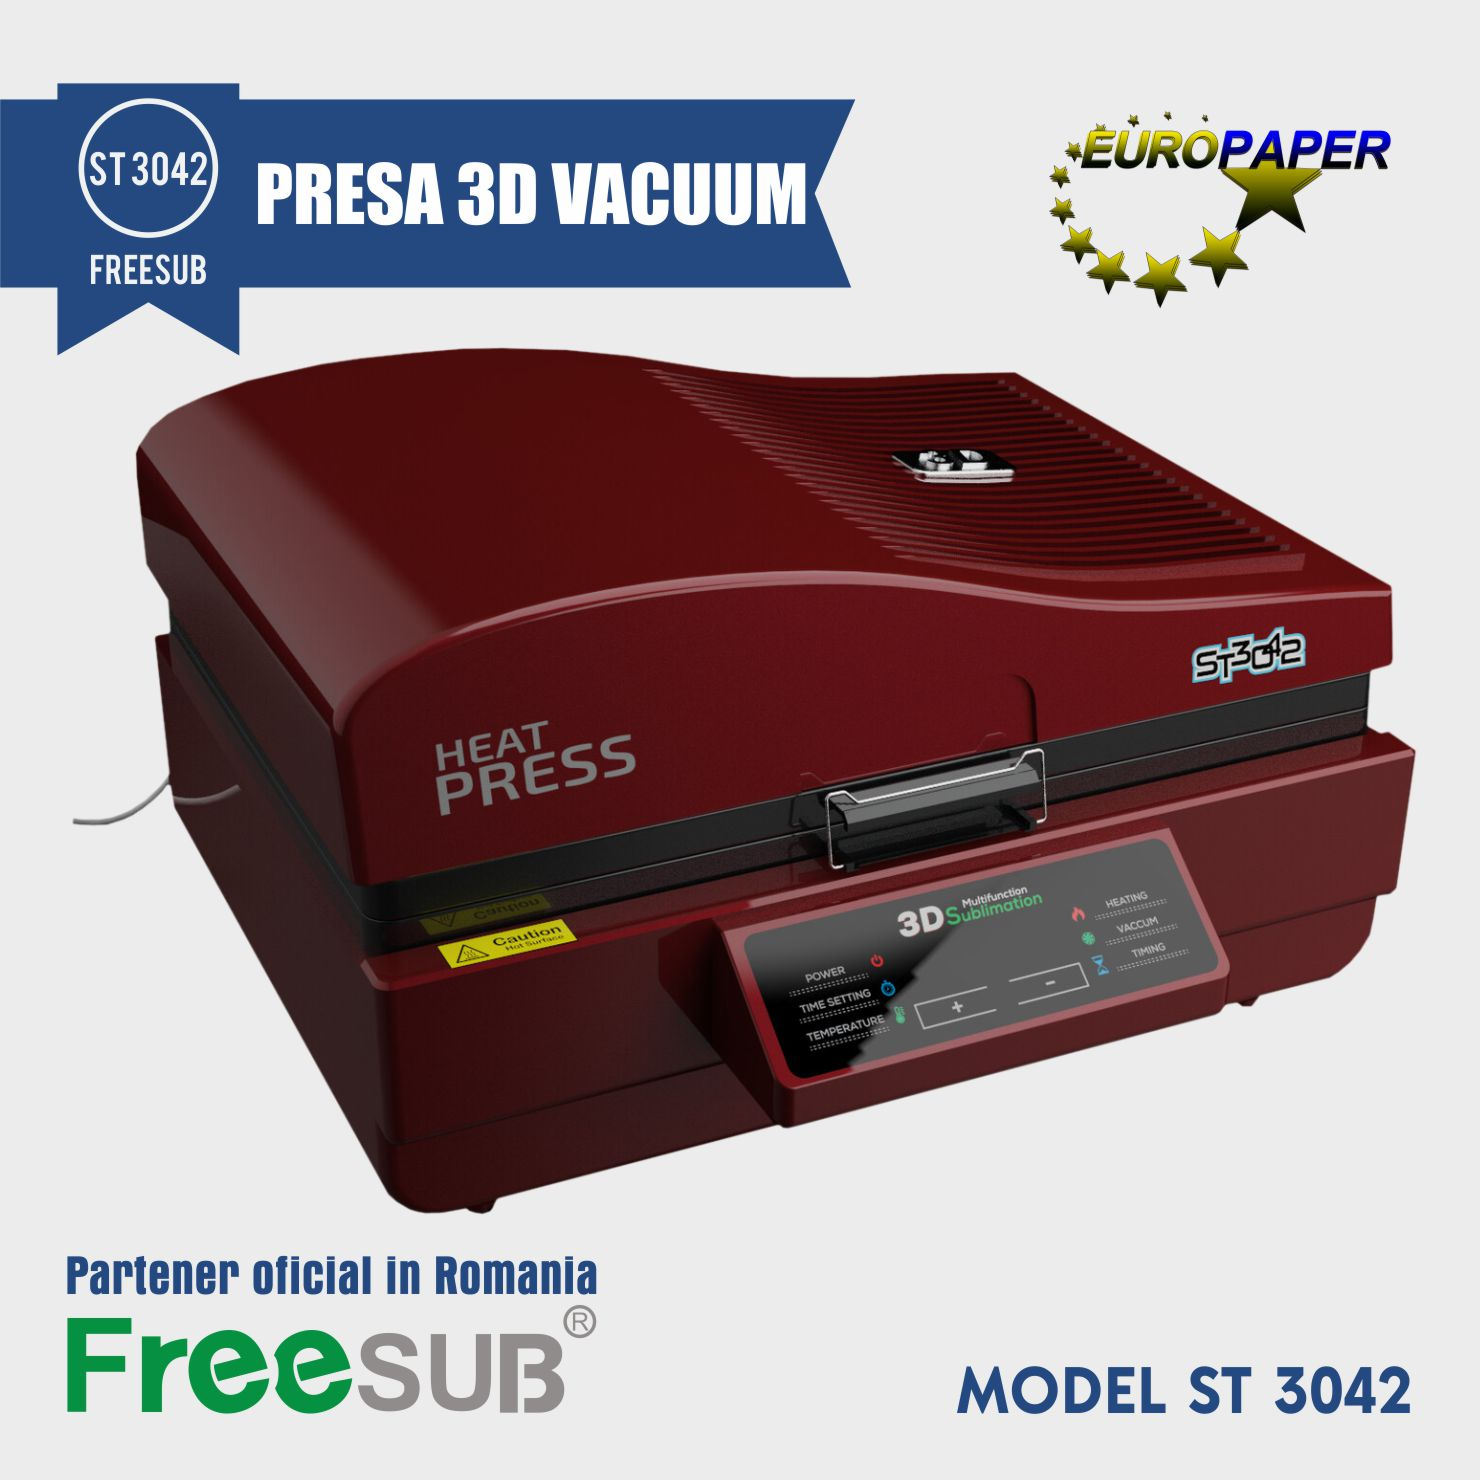 ST 3042 PRESA 3D